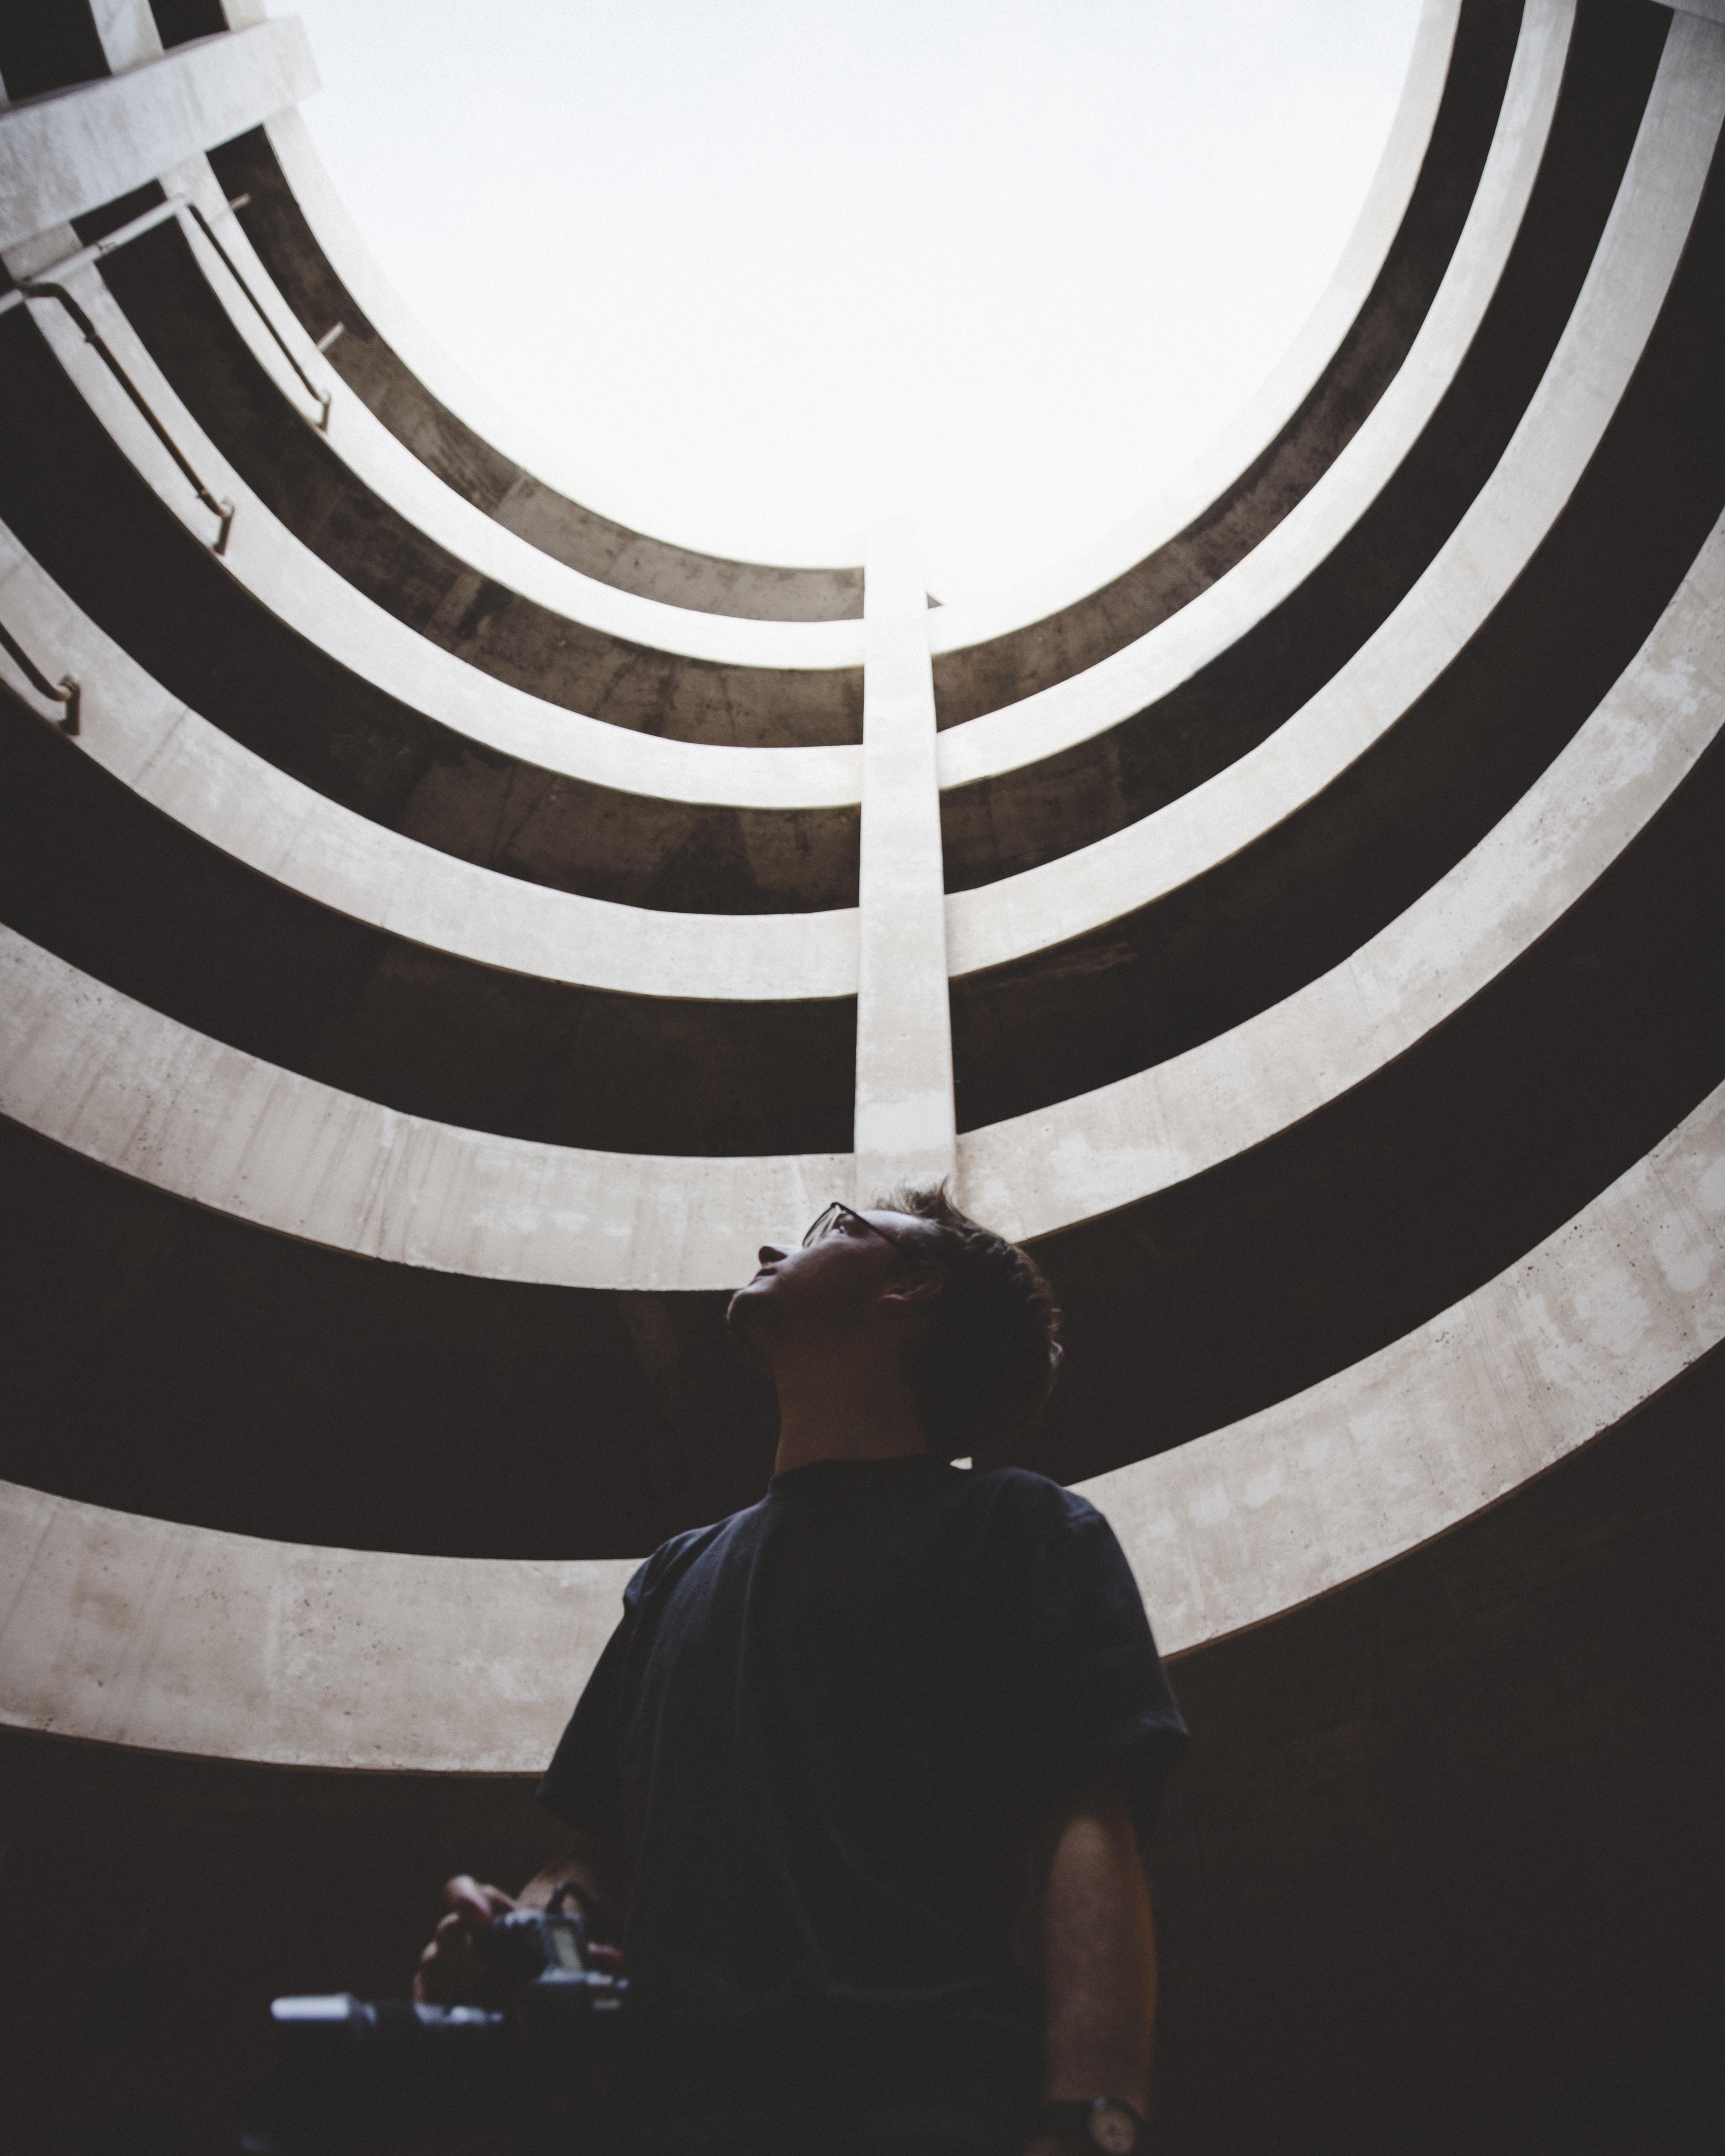 man in blue crew-neck t-shirt holding black DSLR camera looking up inside brown building